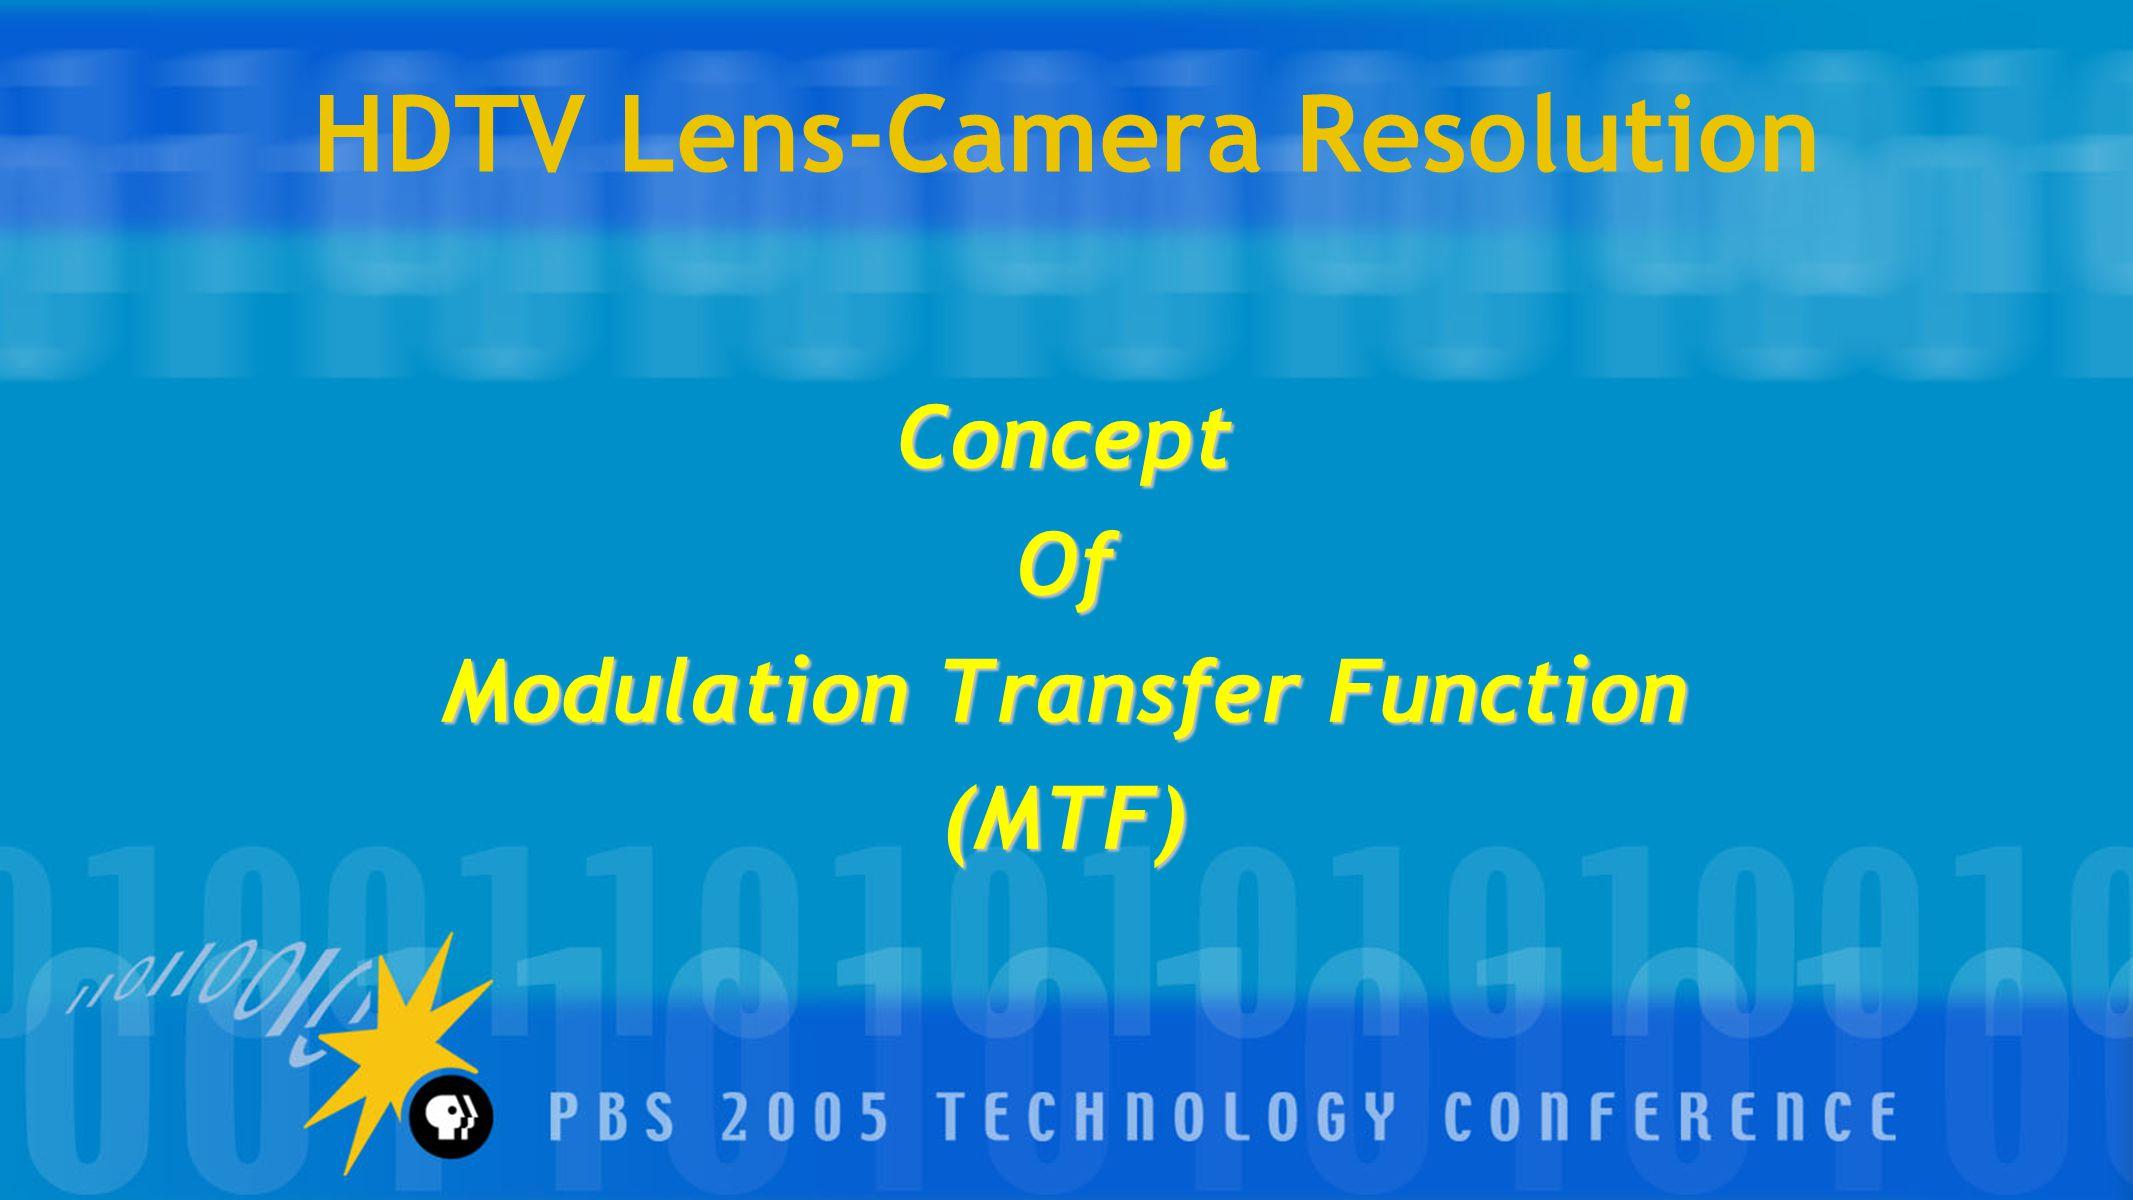 HDTV Lens-Camera Resolution ConceptOf Modulation Transfer Function (MTF)